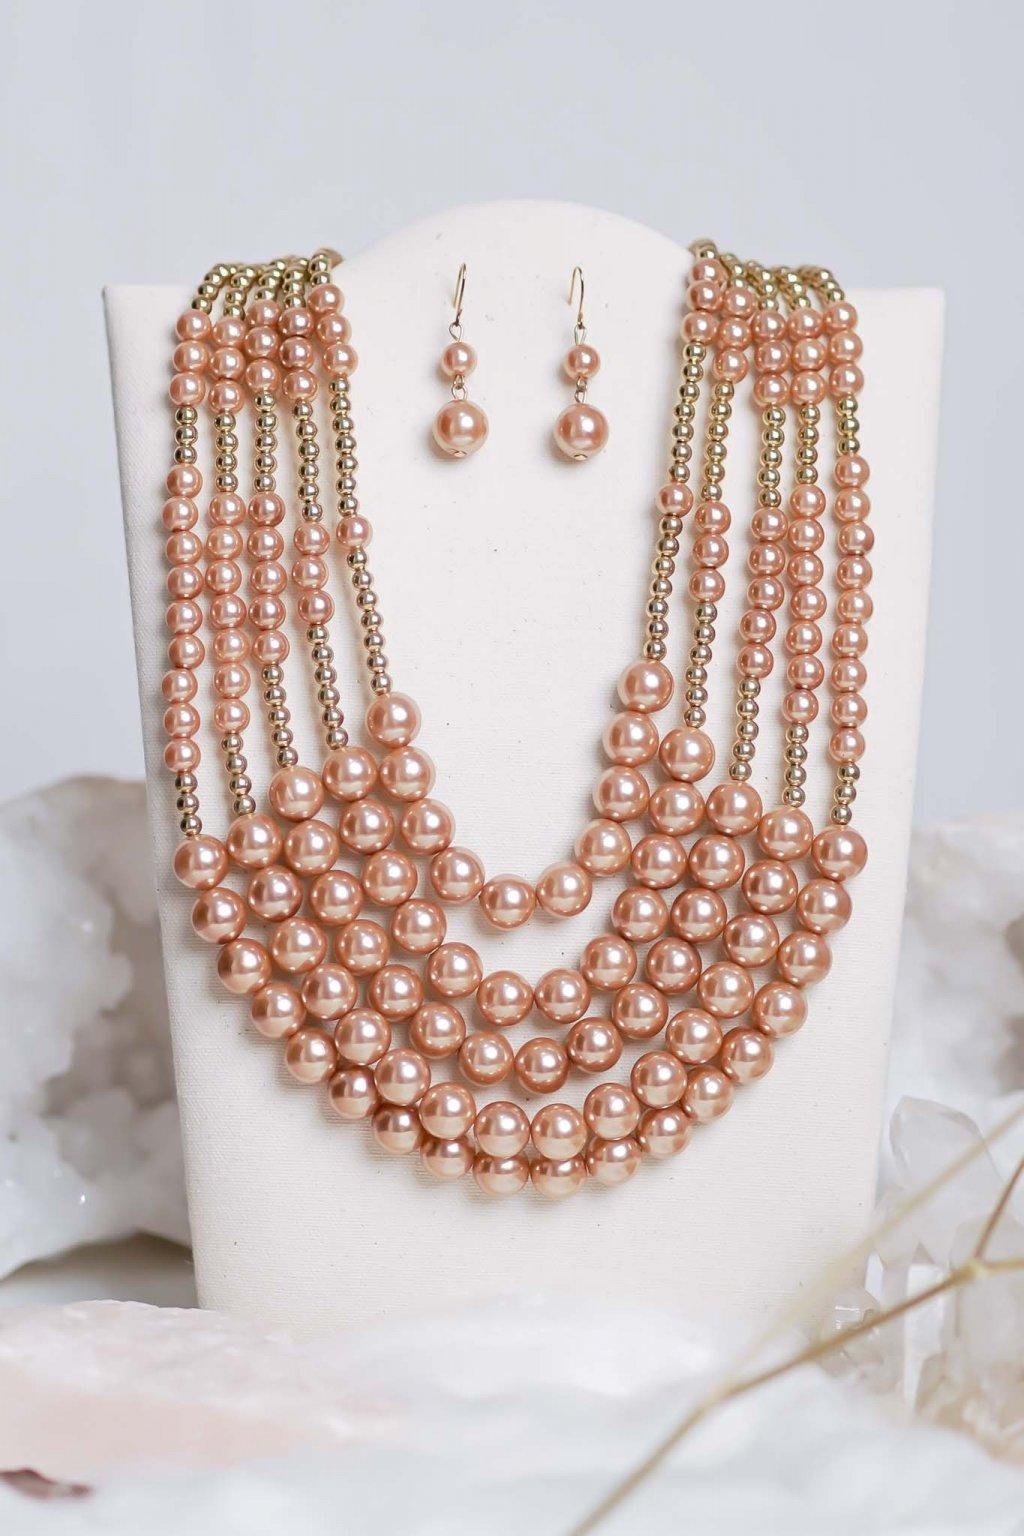 náhrdelník, šperk, spoločenská náhrdelník, náhrdelník na bežný deň, výrazný náhrdelník, jemný náhrdelník, šperky, náhrdelník na ples, svadbu, stužkovú 01